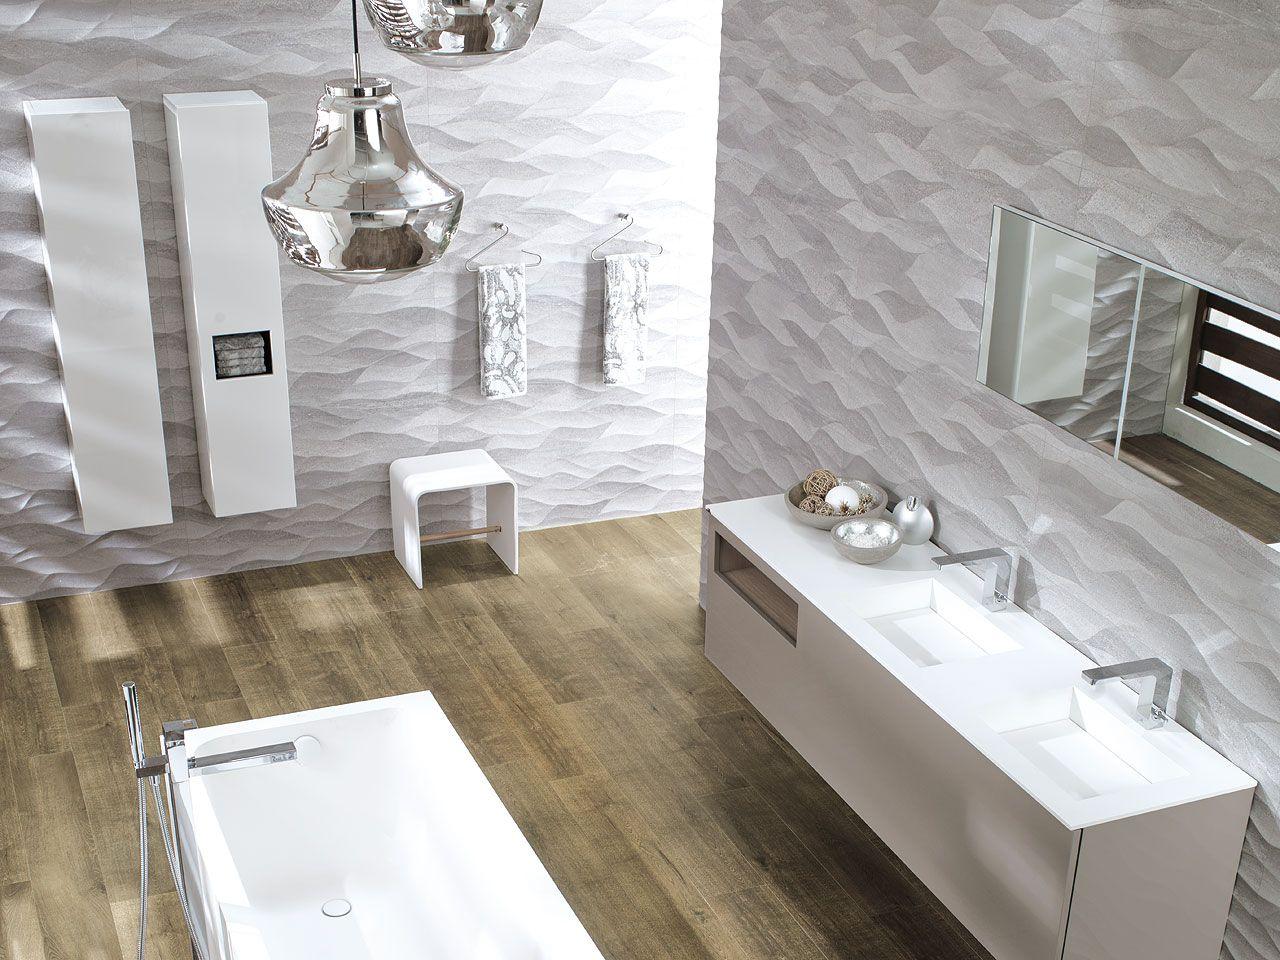 Astonishing Modern Bathroom Tile Design On Bathroom With All ...